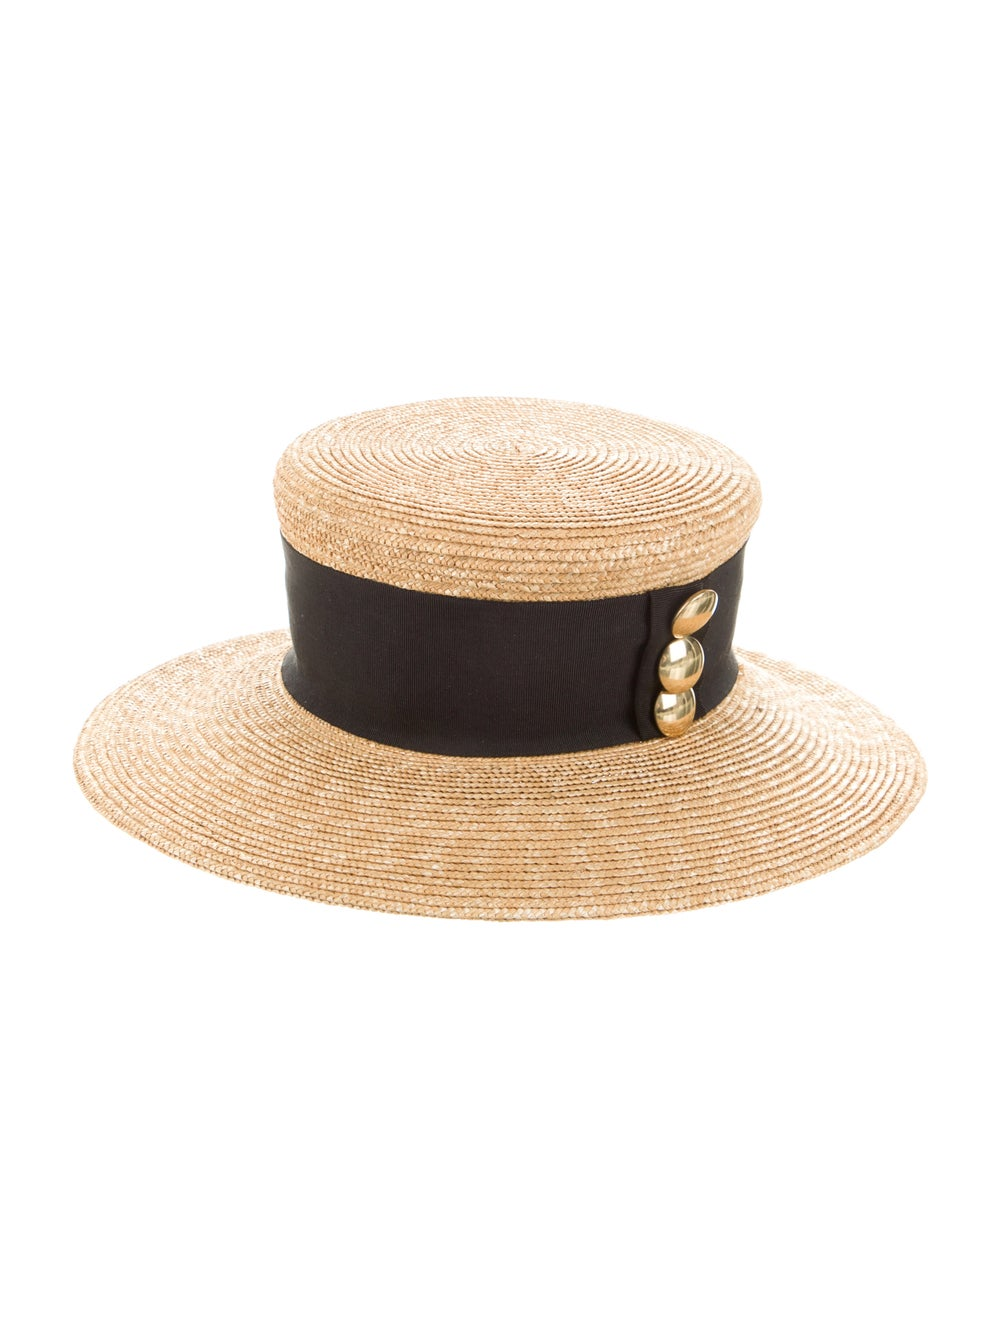 Patricia Underwood Raffia Wide Brim Fedora Hat Tan - image 1